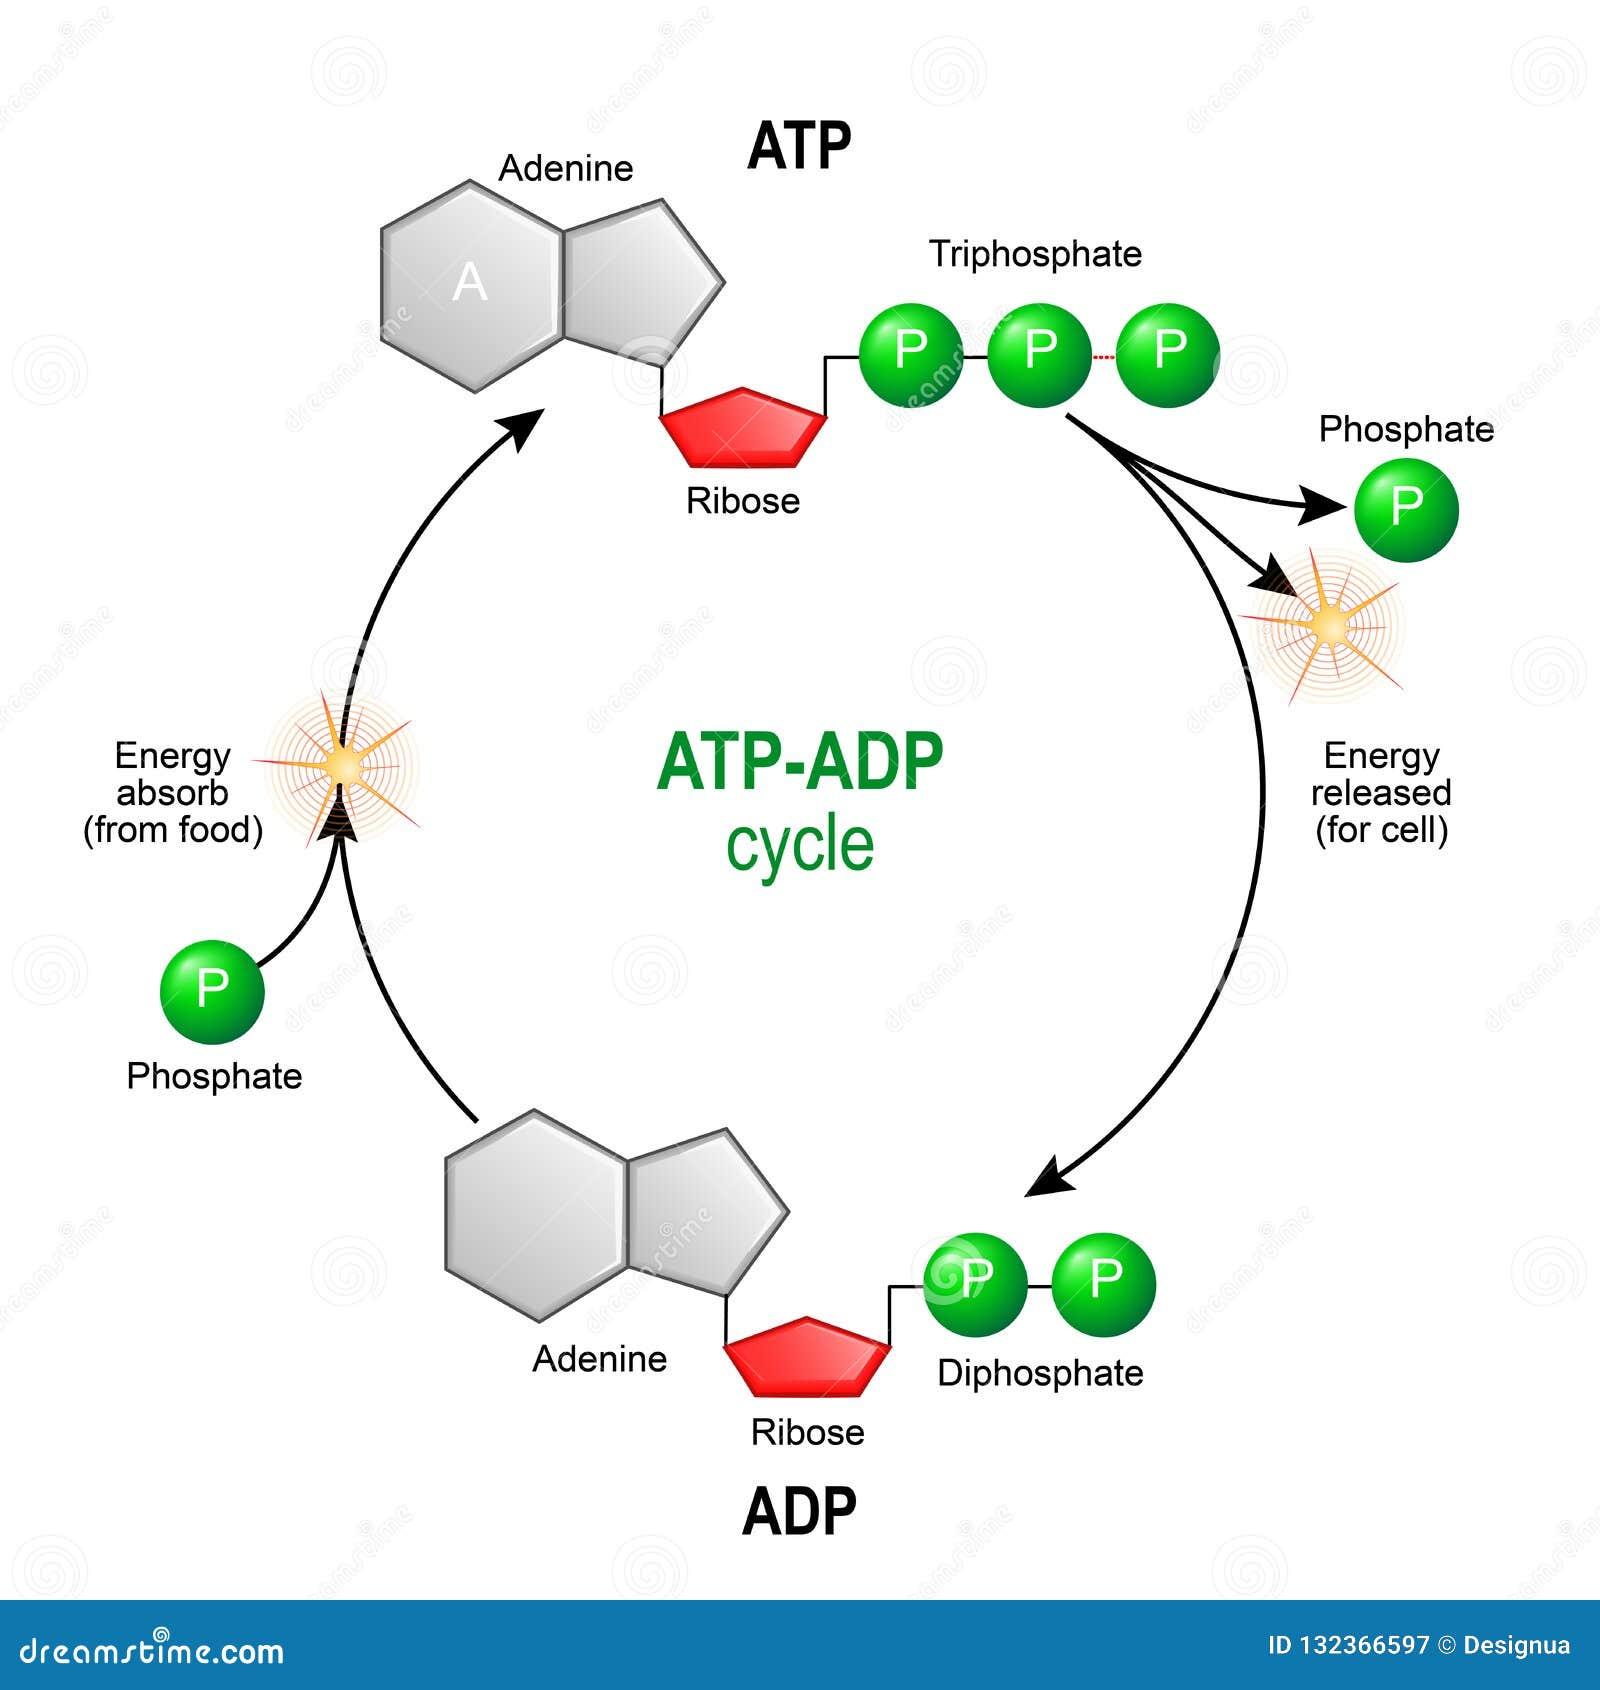 ADP - ADP - JapaneseClass.jp